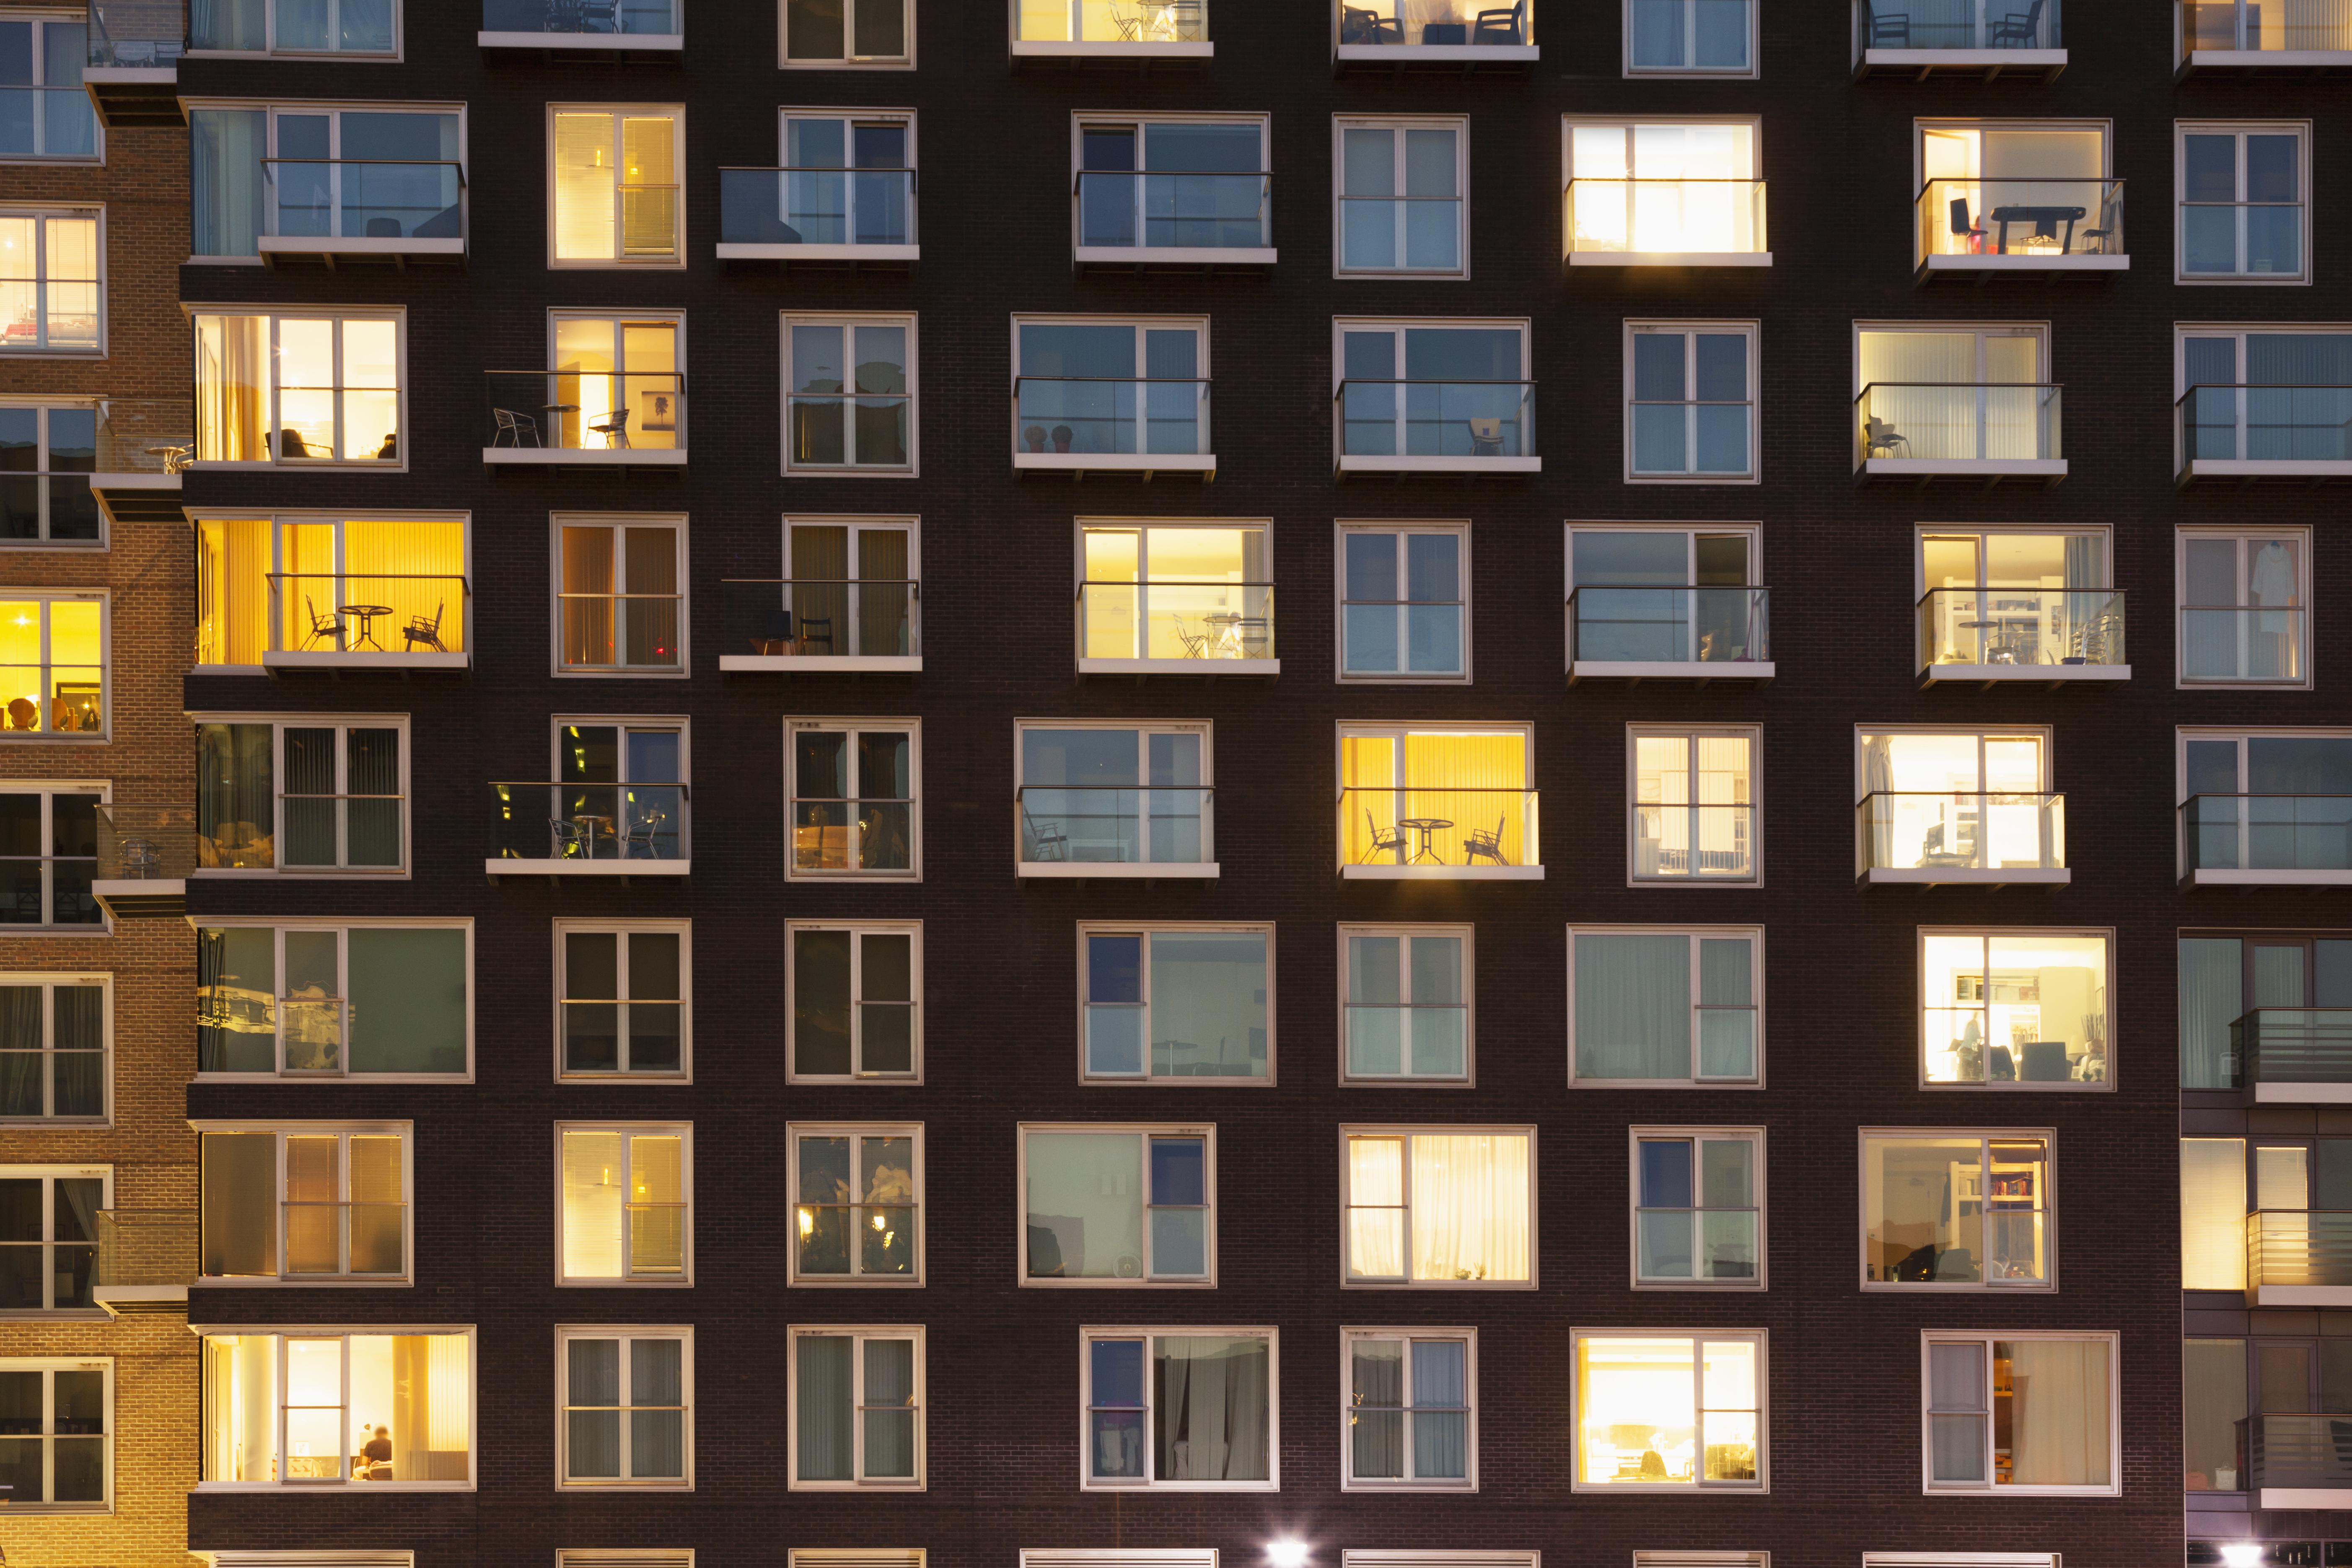 Modern apartment block at dusk themes of urban scene apartment housing